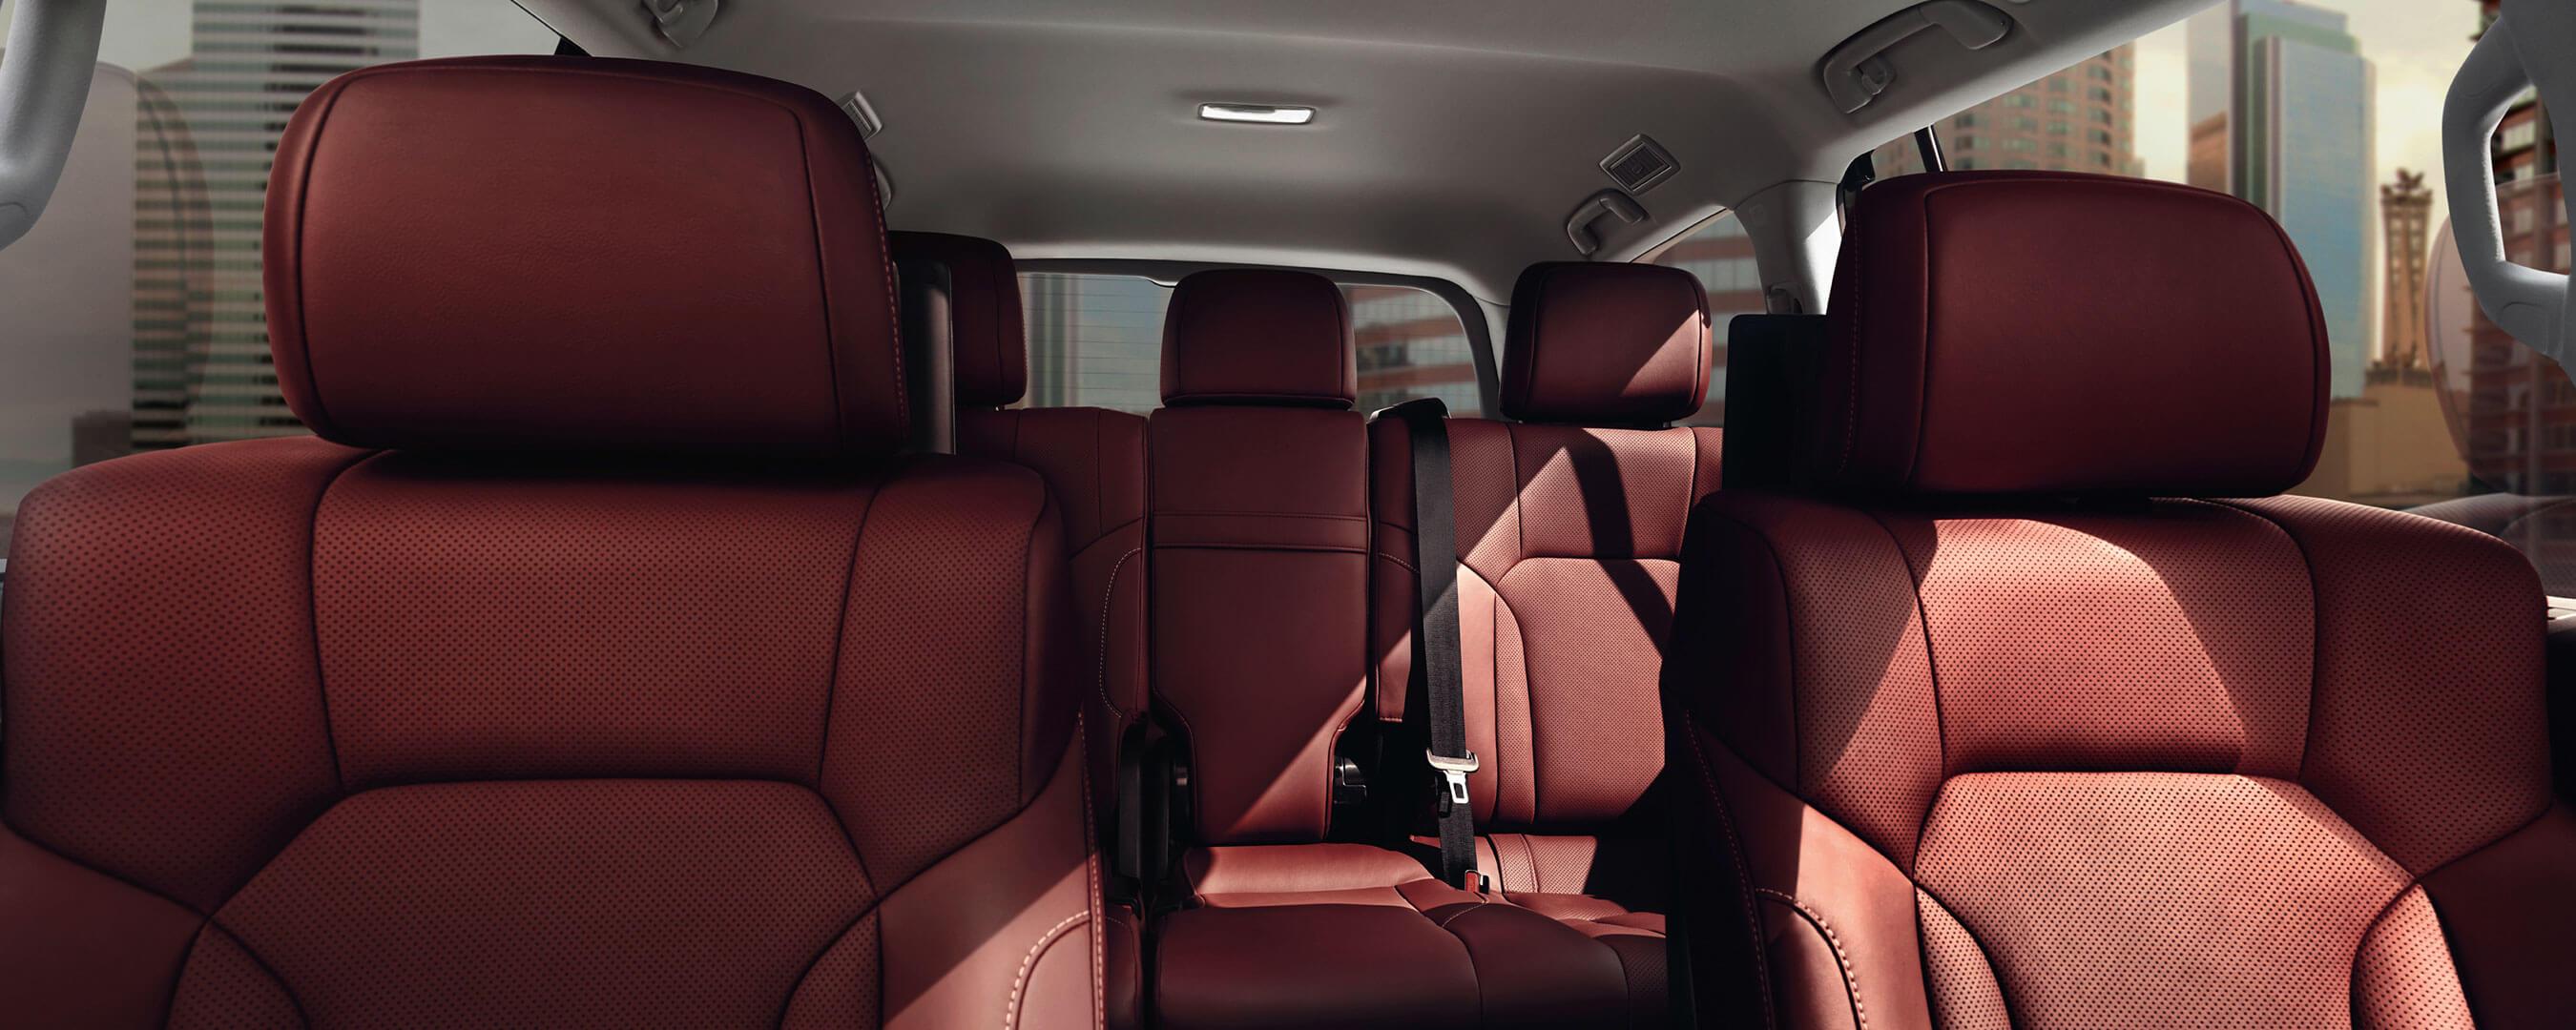 2017 lexus lx 570 experience hero interior back